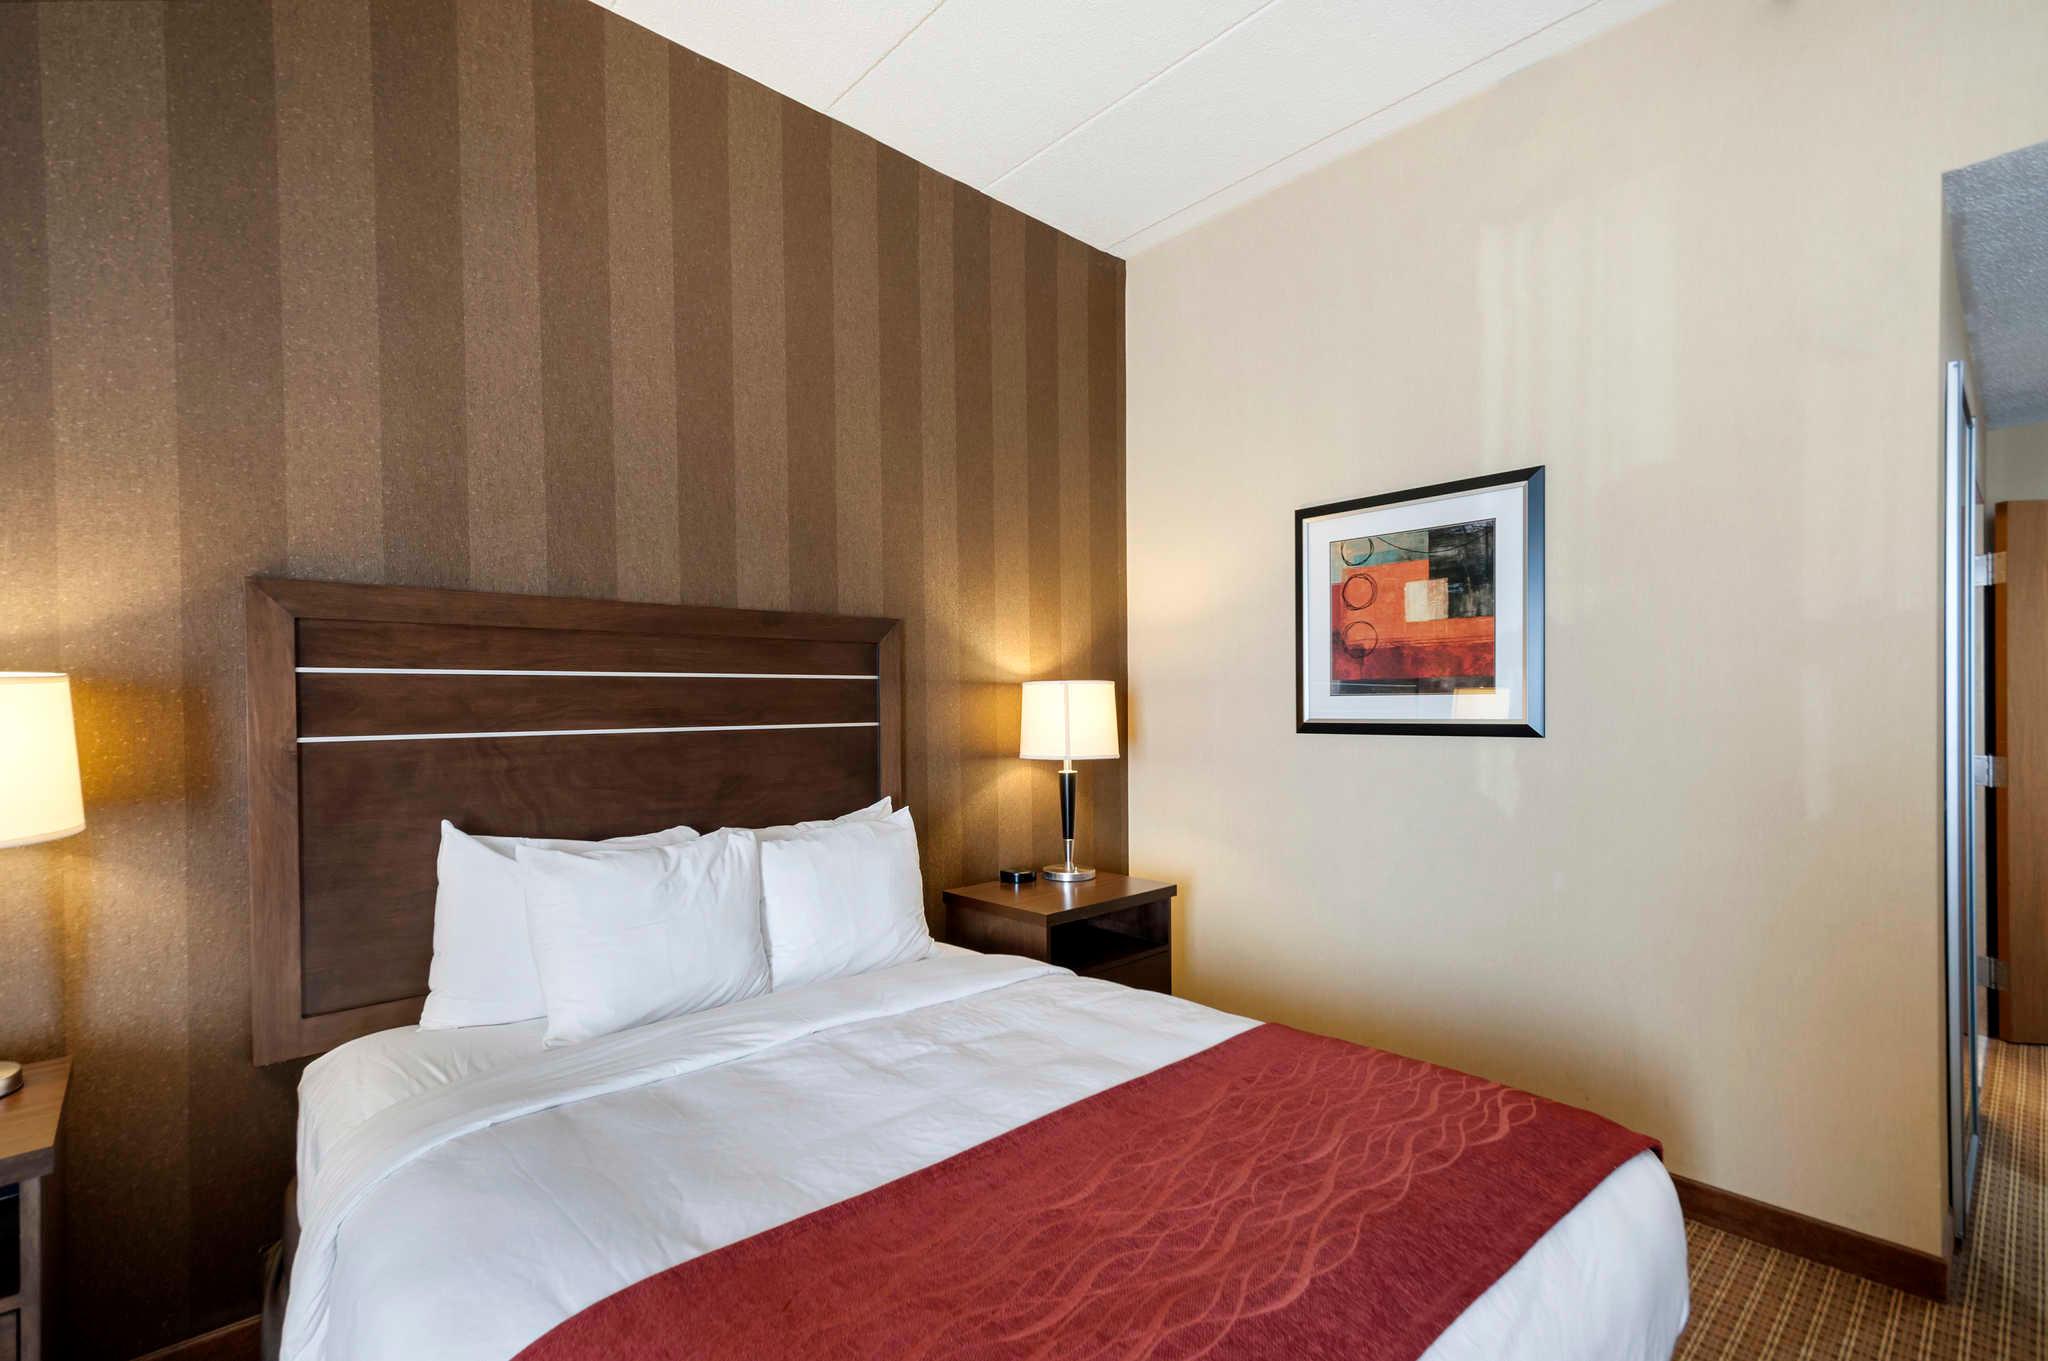 Comfort Inn & Suites Edgewood - Aberdeen image 18